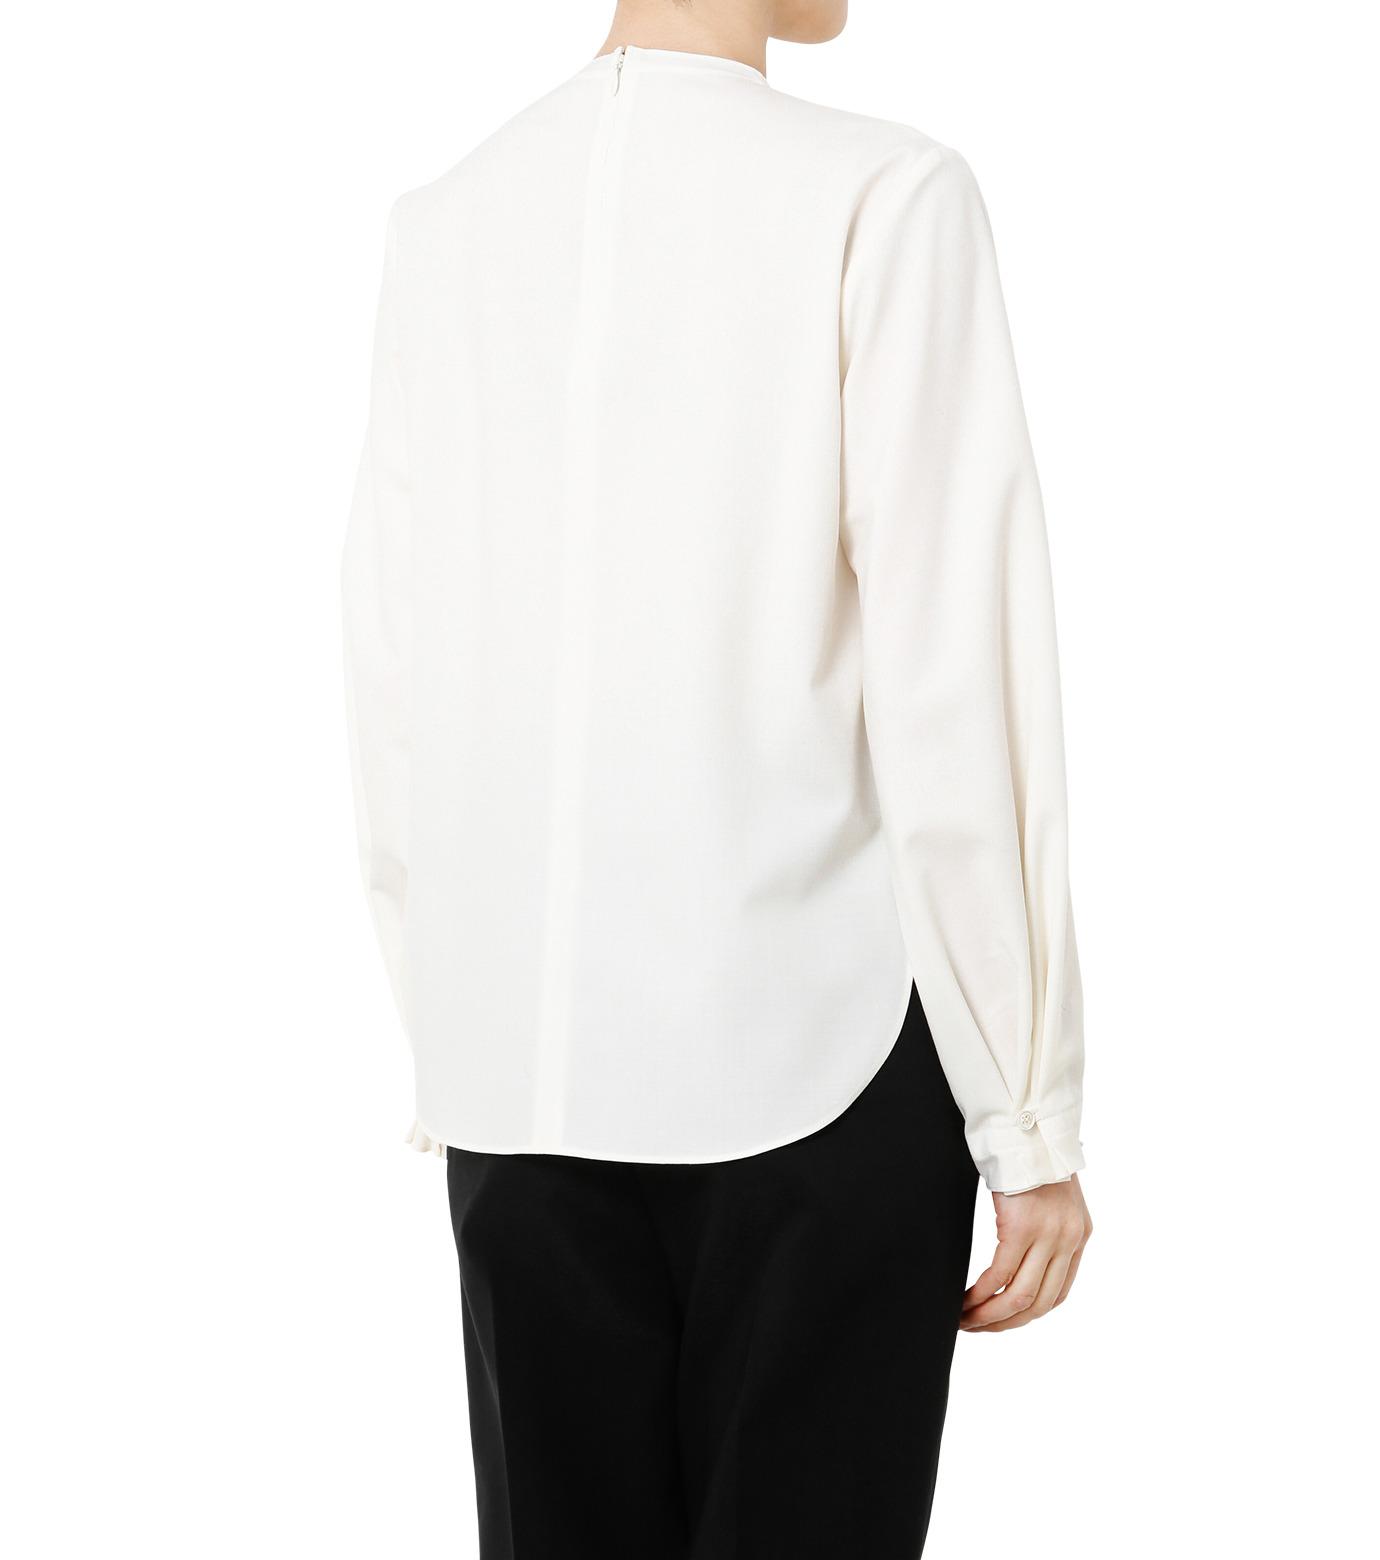 LE CIEL BLEU(ルシェルブルー)のミニマルパフスリーブトップス-WHITE(シャツ/shirt)-19S63108 拡大詳細画像4